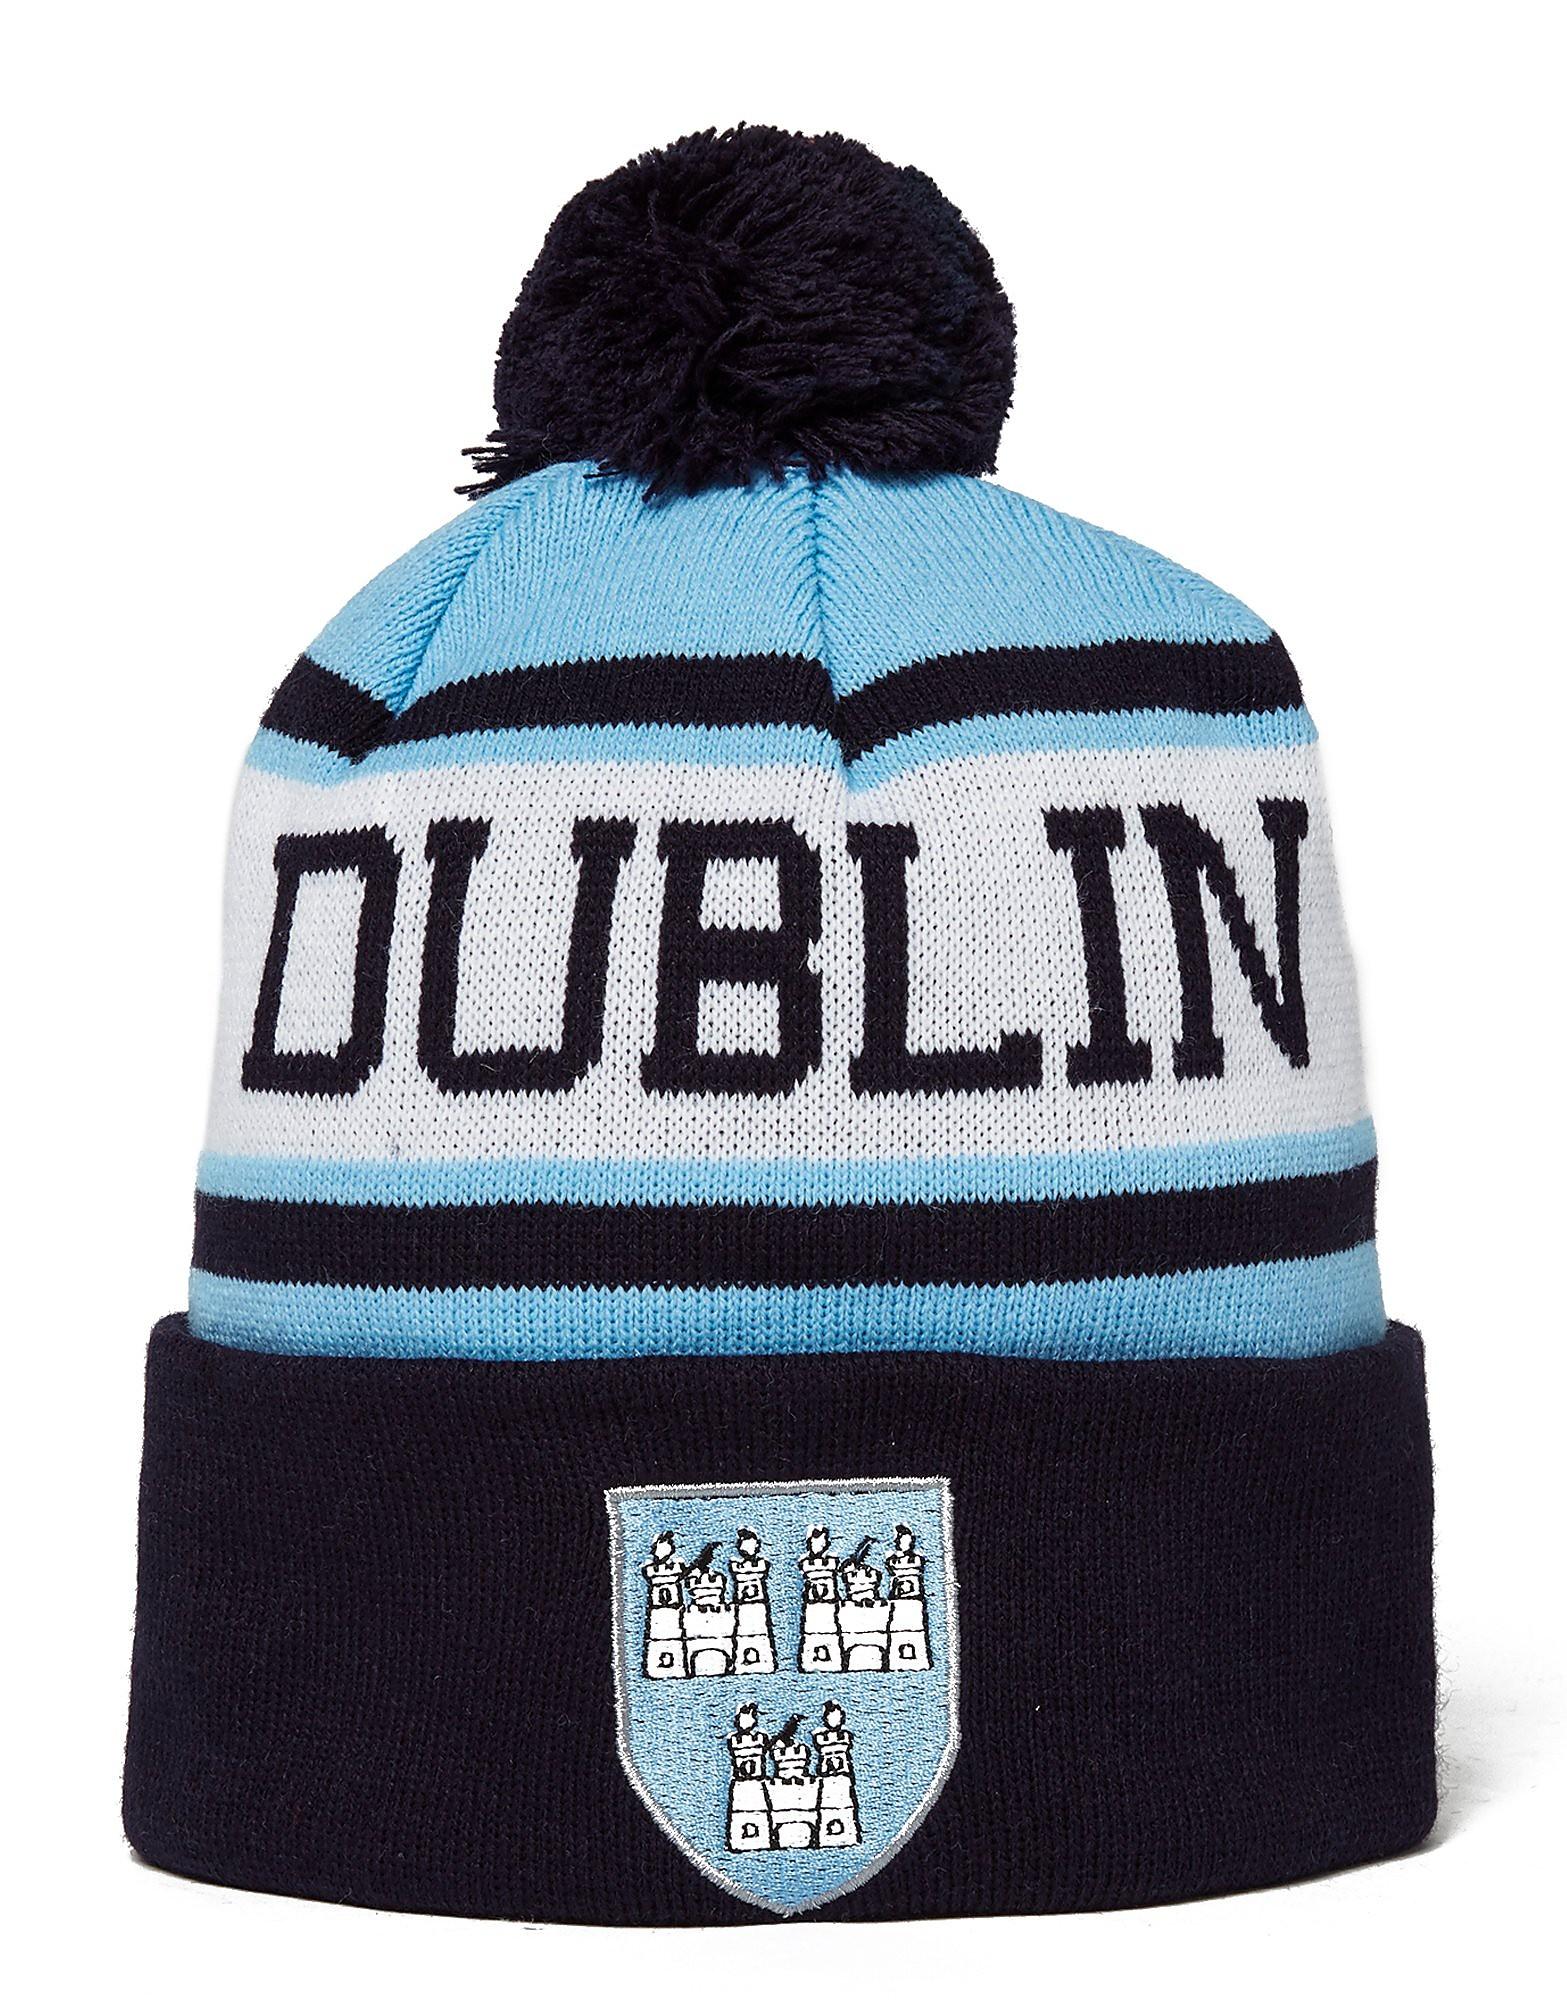 Official Team Dublin Beanie - Sky Blue - Heren